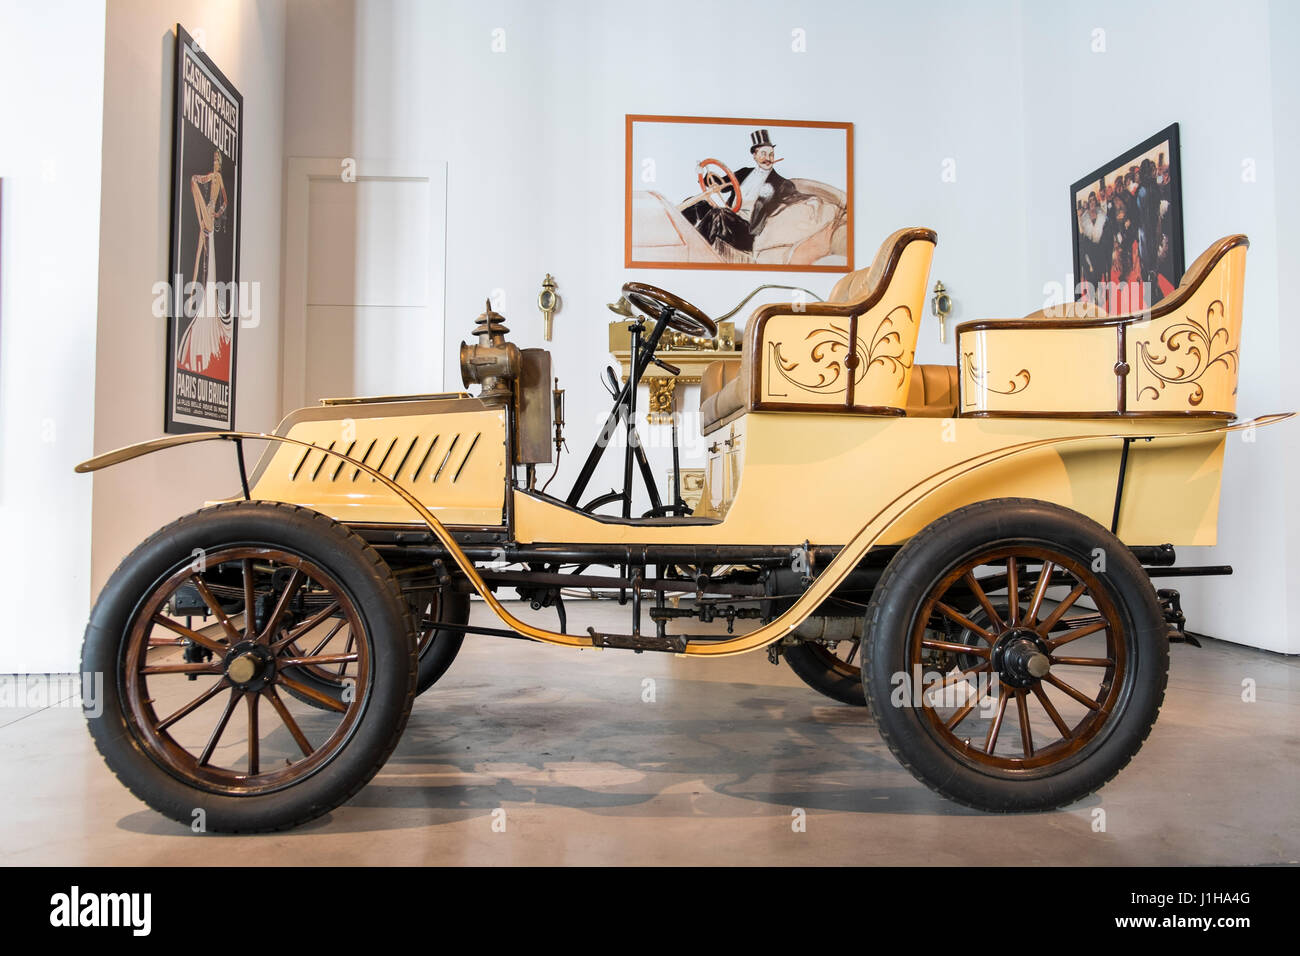 1903 De Dion-Bouton. Toulouse-Lautrec style. Automobile Museum of Málaga, Andalusia, Spain - Stock Image